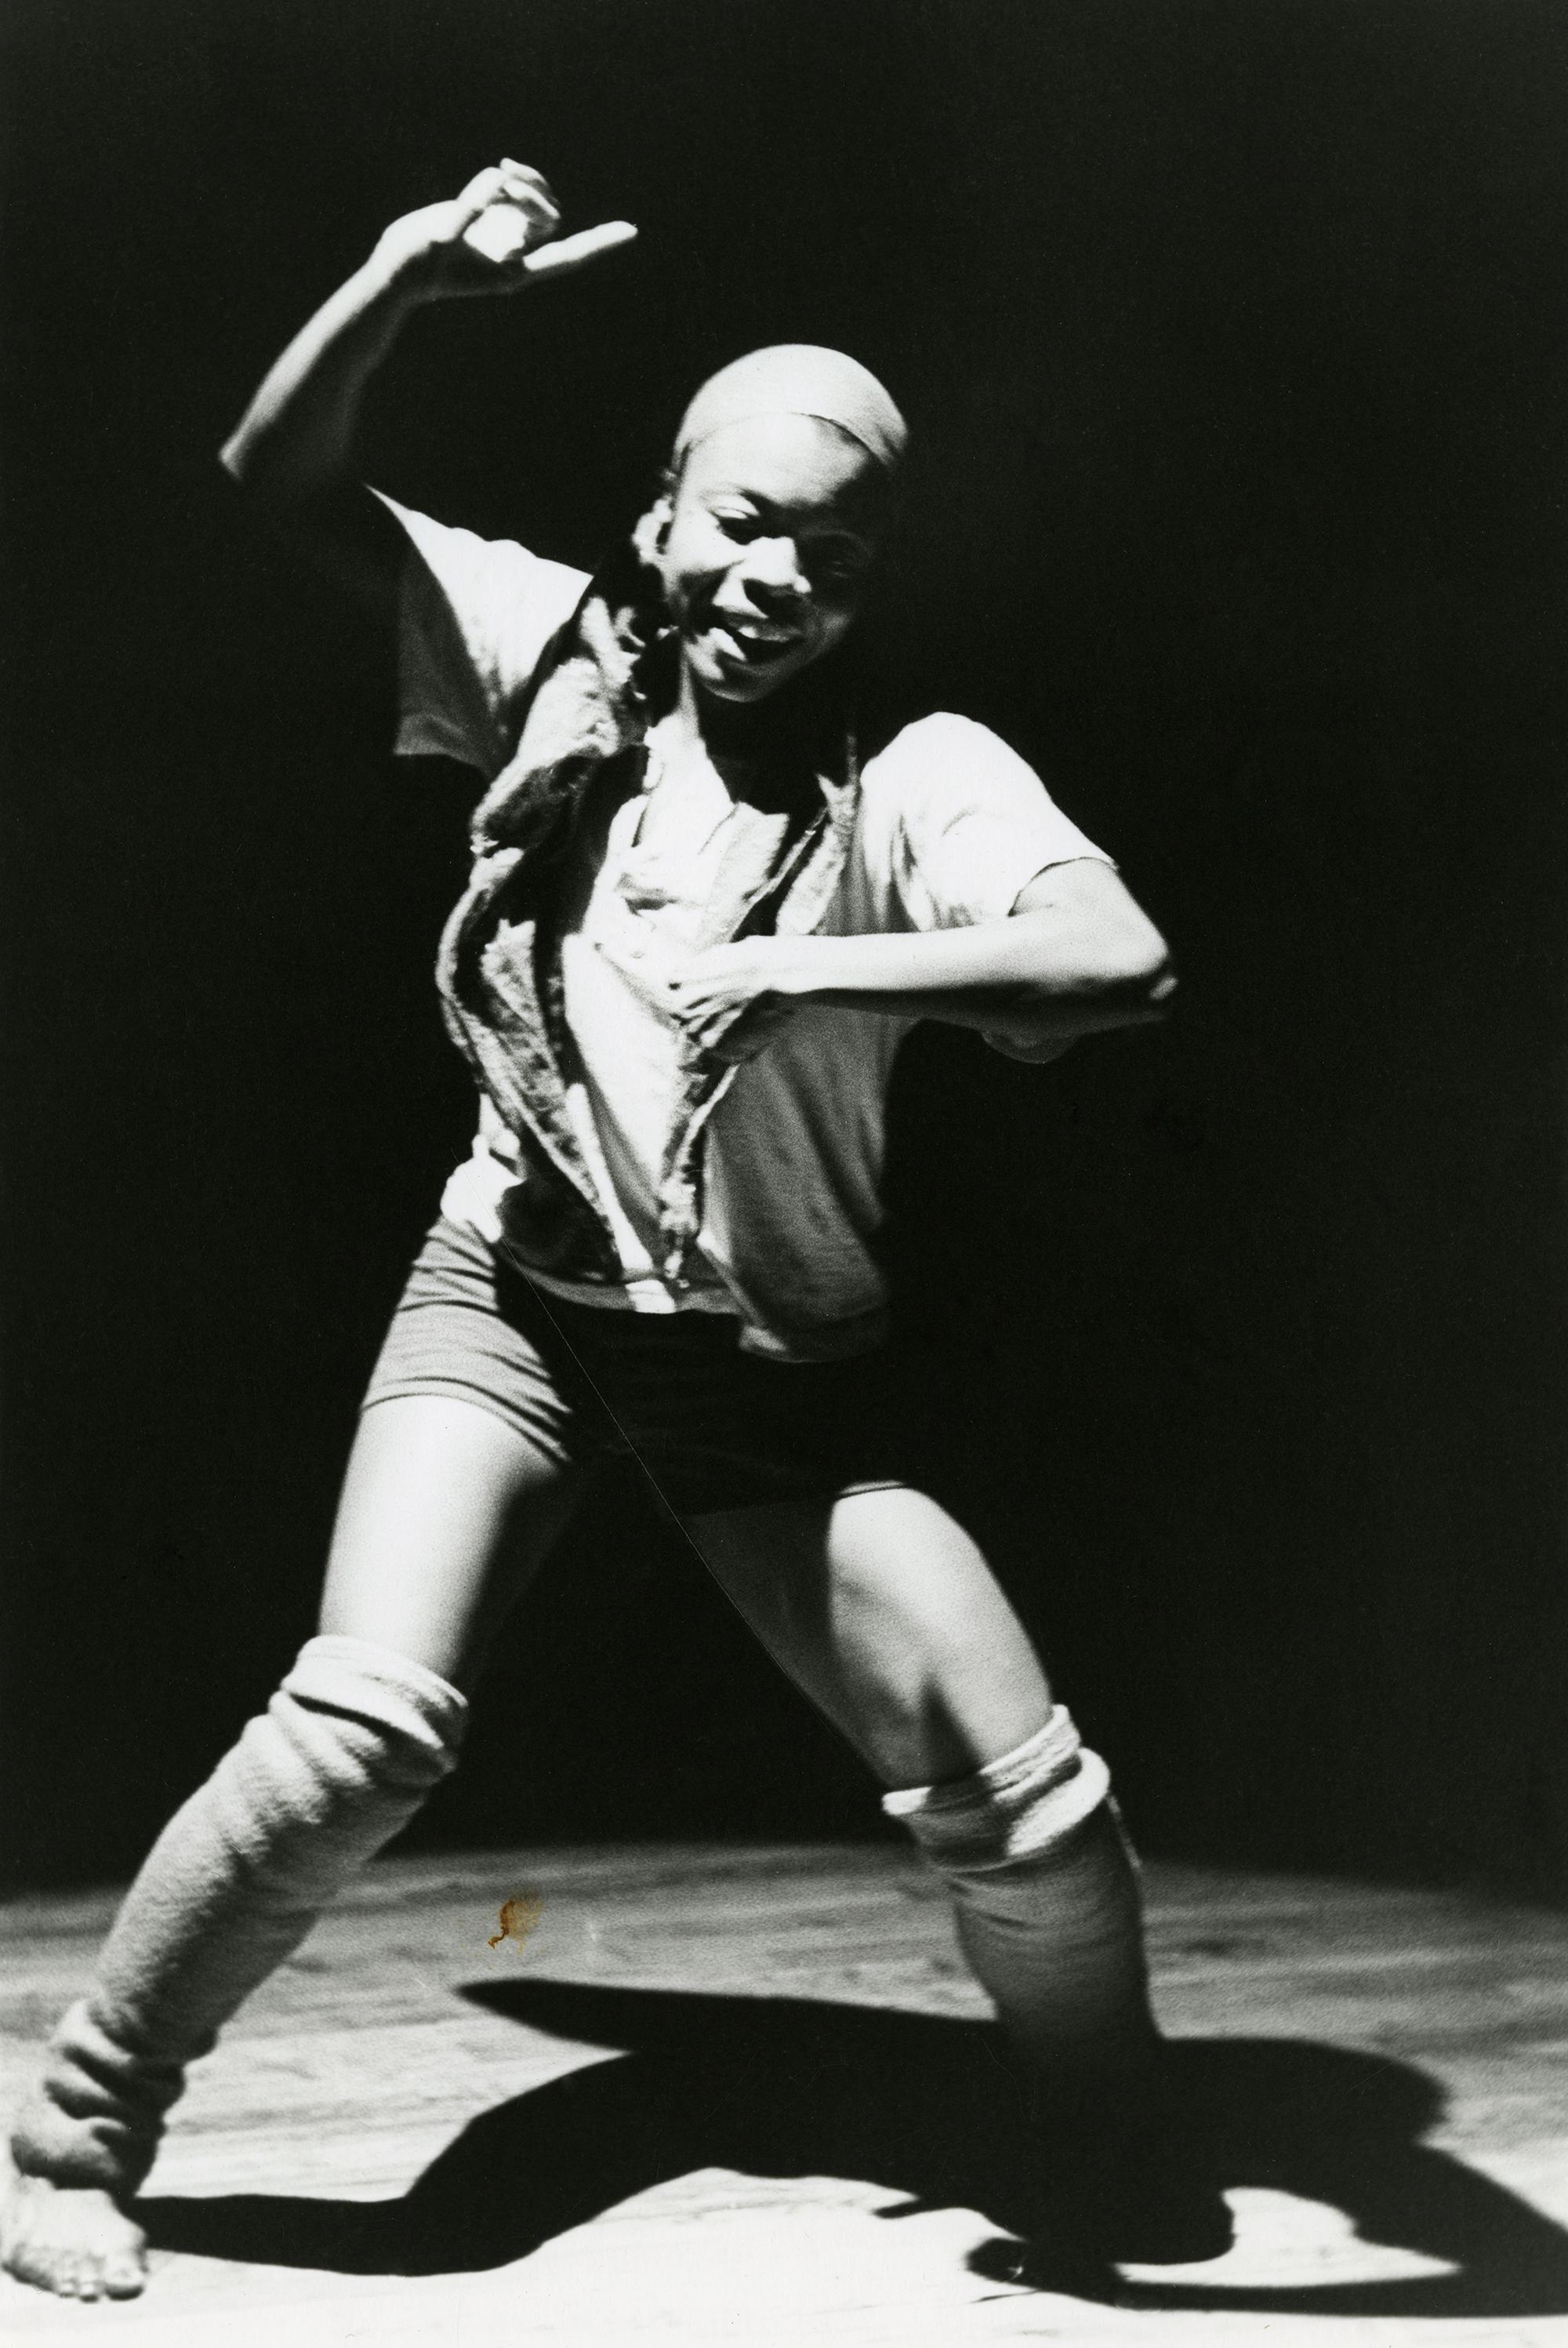 Lona Foote, Blondell Cummings performing  Blind Dates  at Just Above Midtown Gallery, 1982.